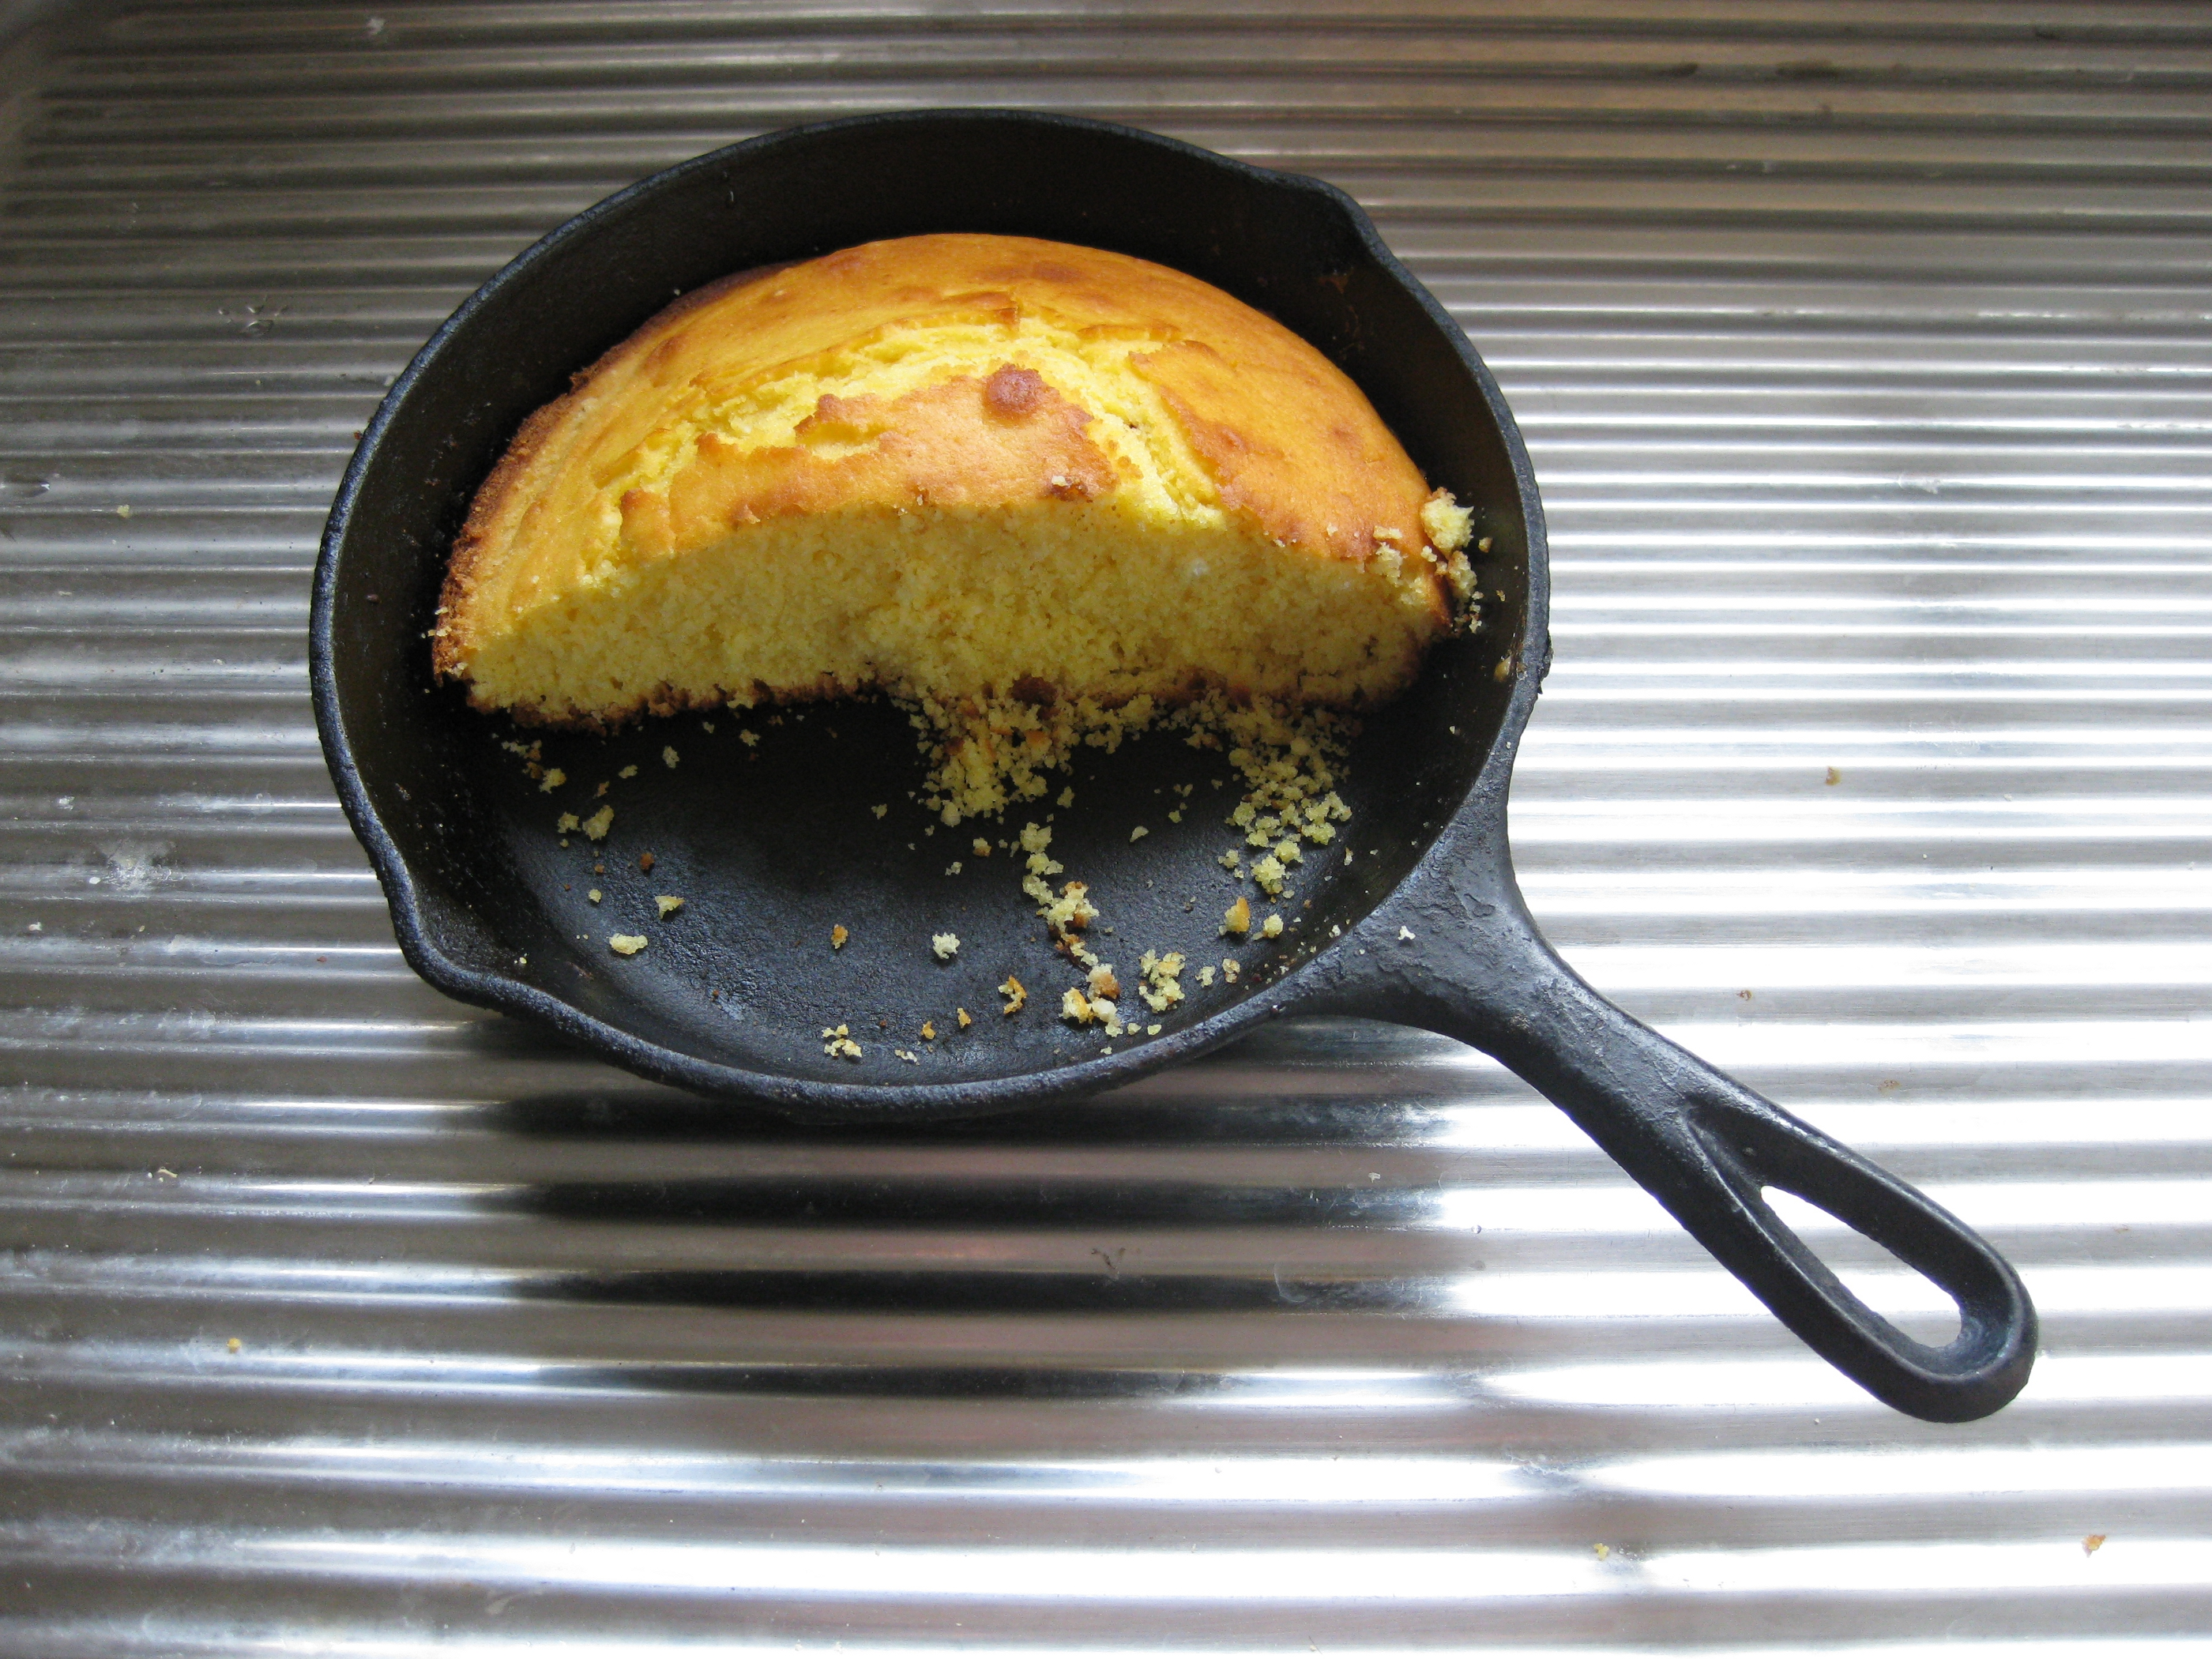 File:Cornbread in cast iron pan.jpg - Wikimedia Commons